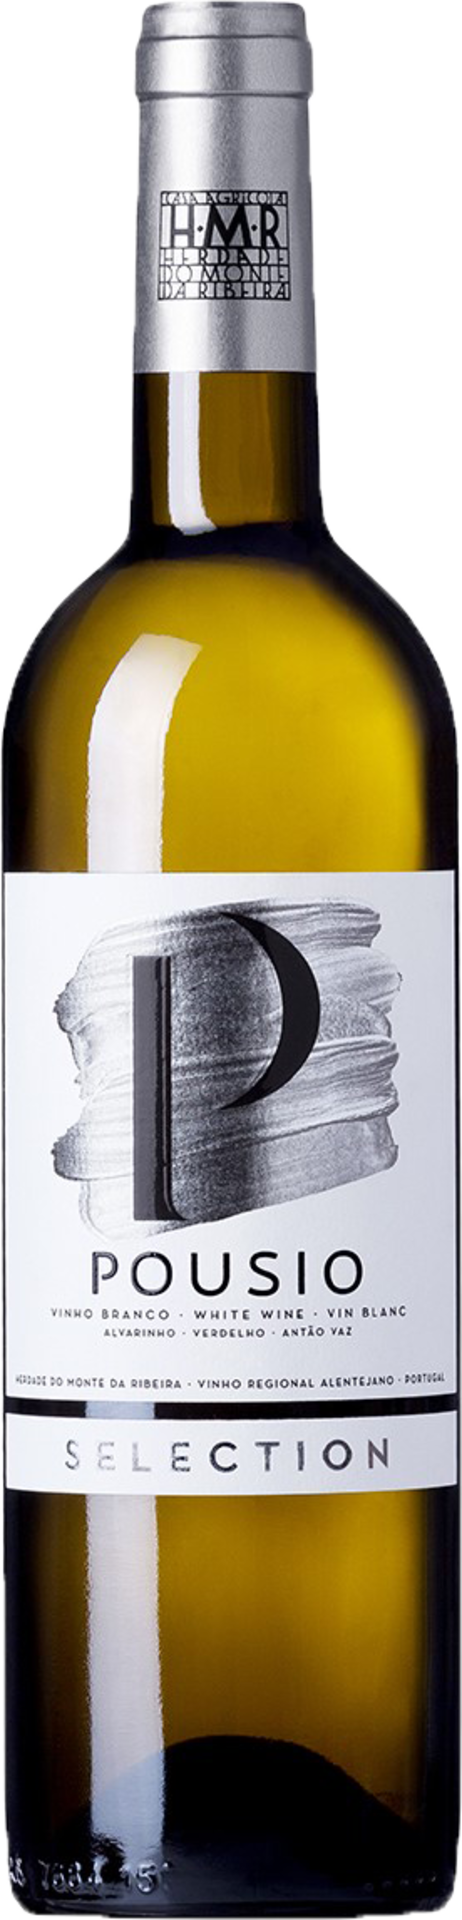 Pousio Vinho Branco Selection Alentejano IG